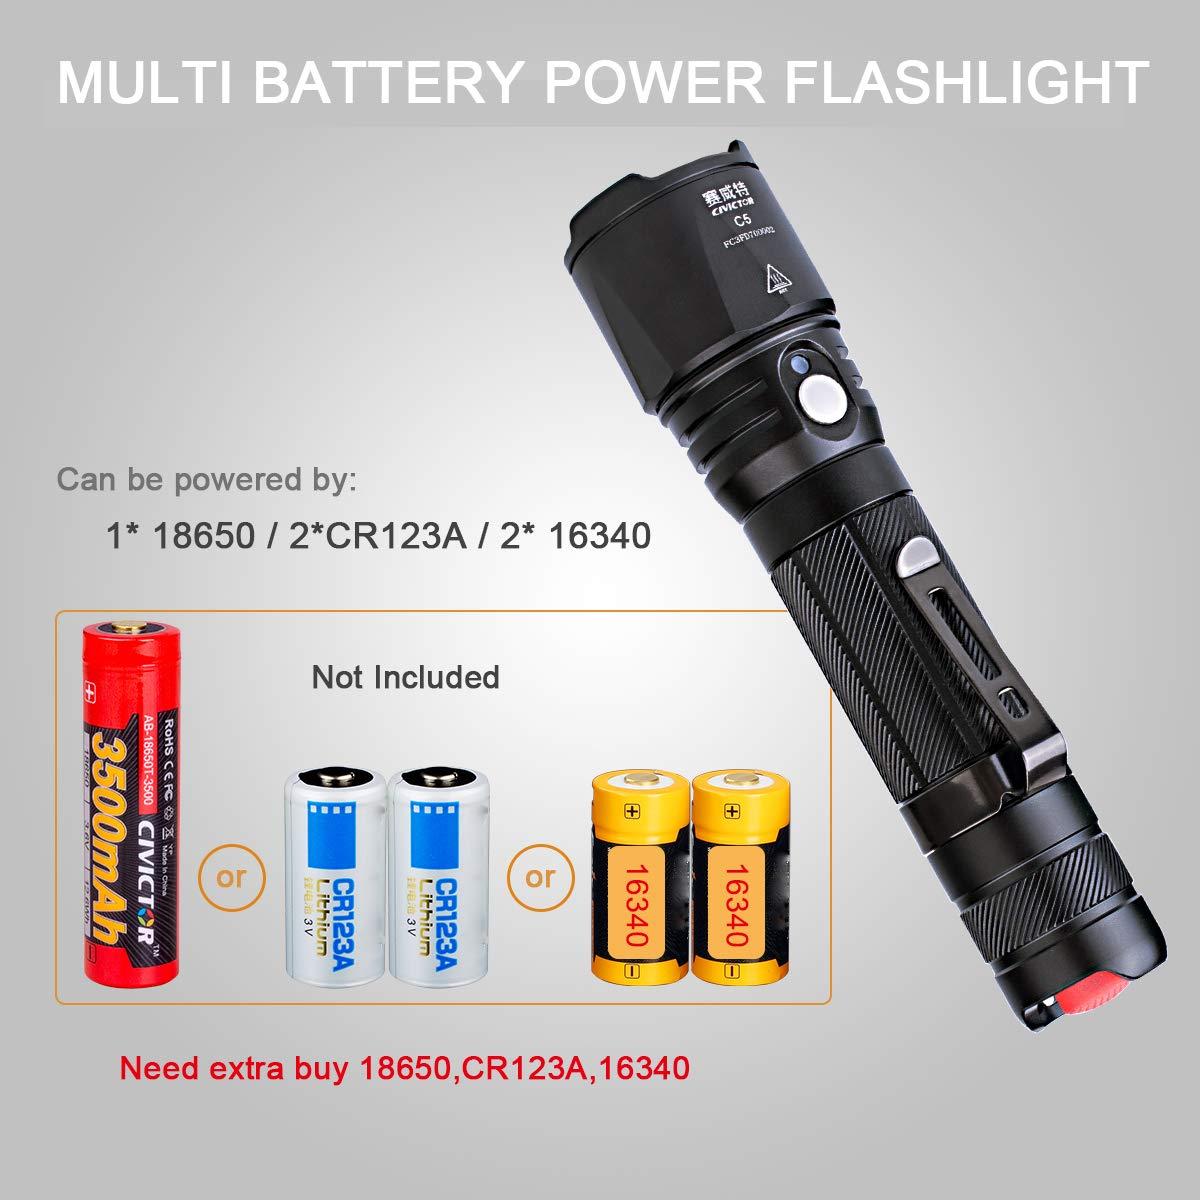 Linternas Led Alta Potencia Largo Alcance 275m Resistente al Agua IPX8 Potente Linterna Recargable Bateria 18650 Pilas Exterior Faroles de mano 900 lumenes ...